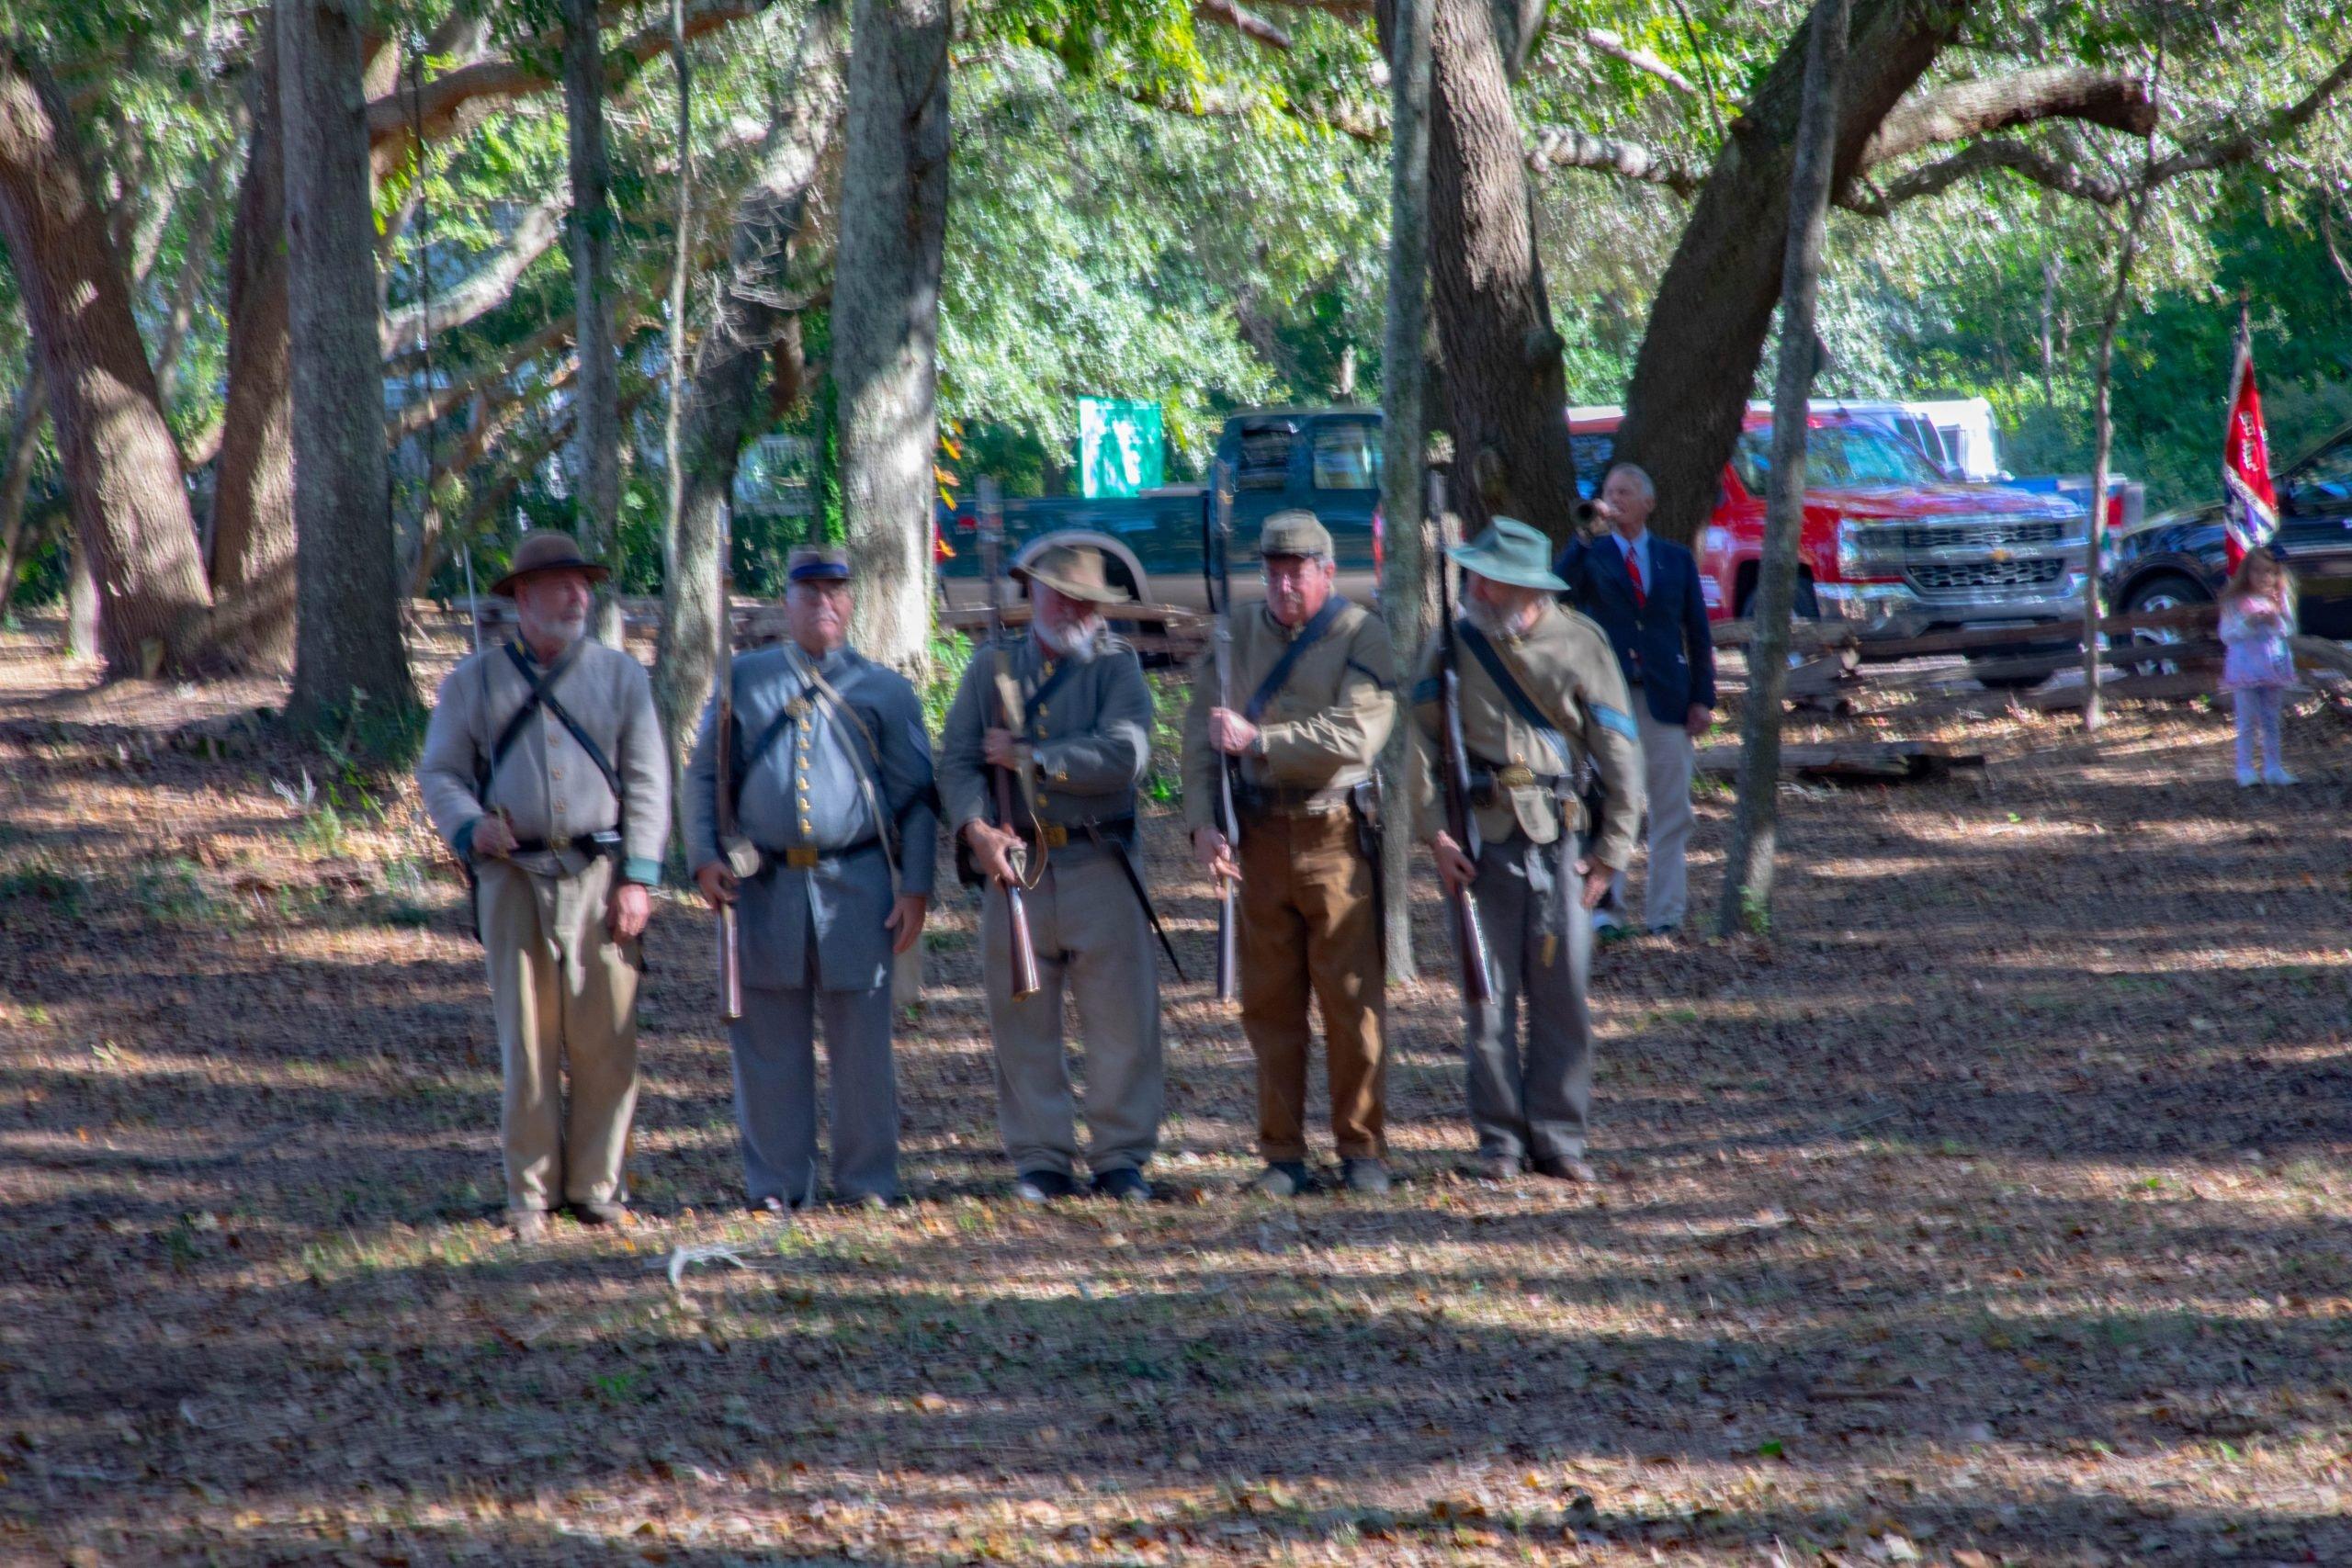 Sons of Confederate Veterans C.S.A. South Carolina 18